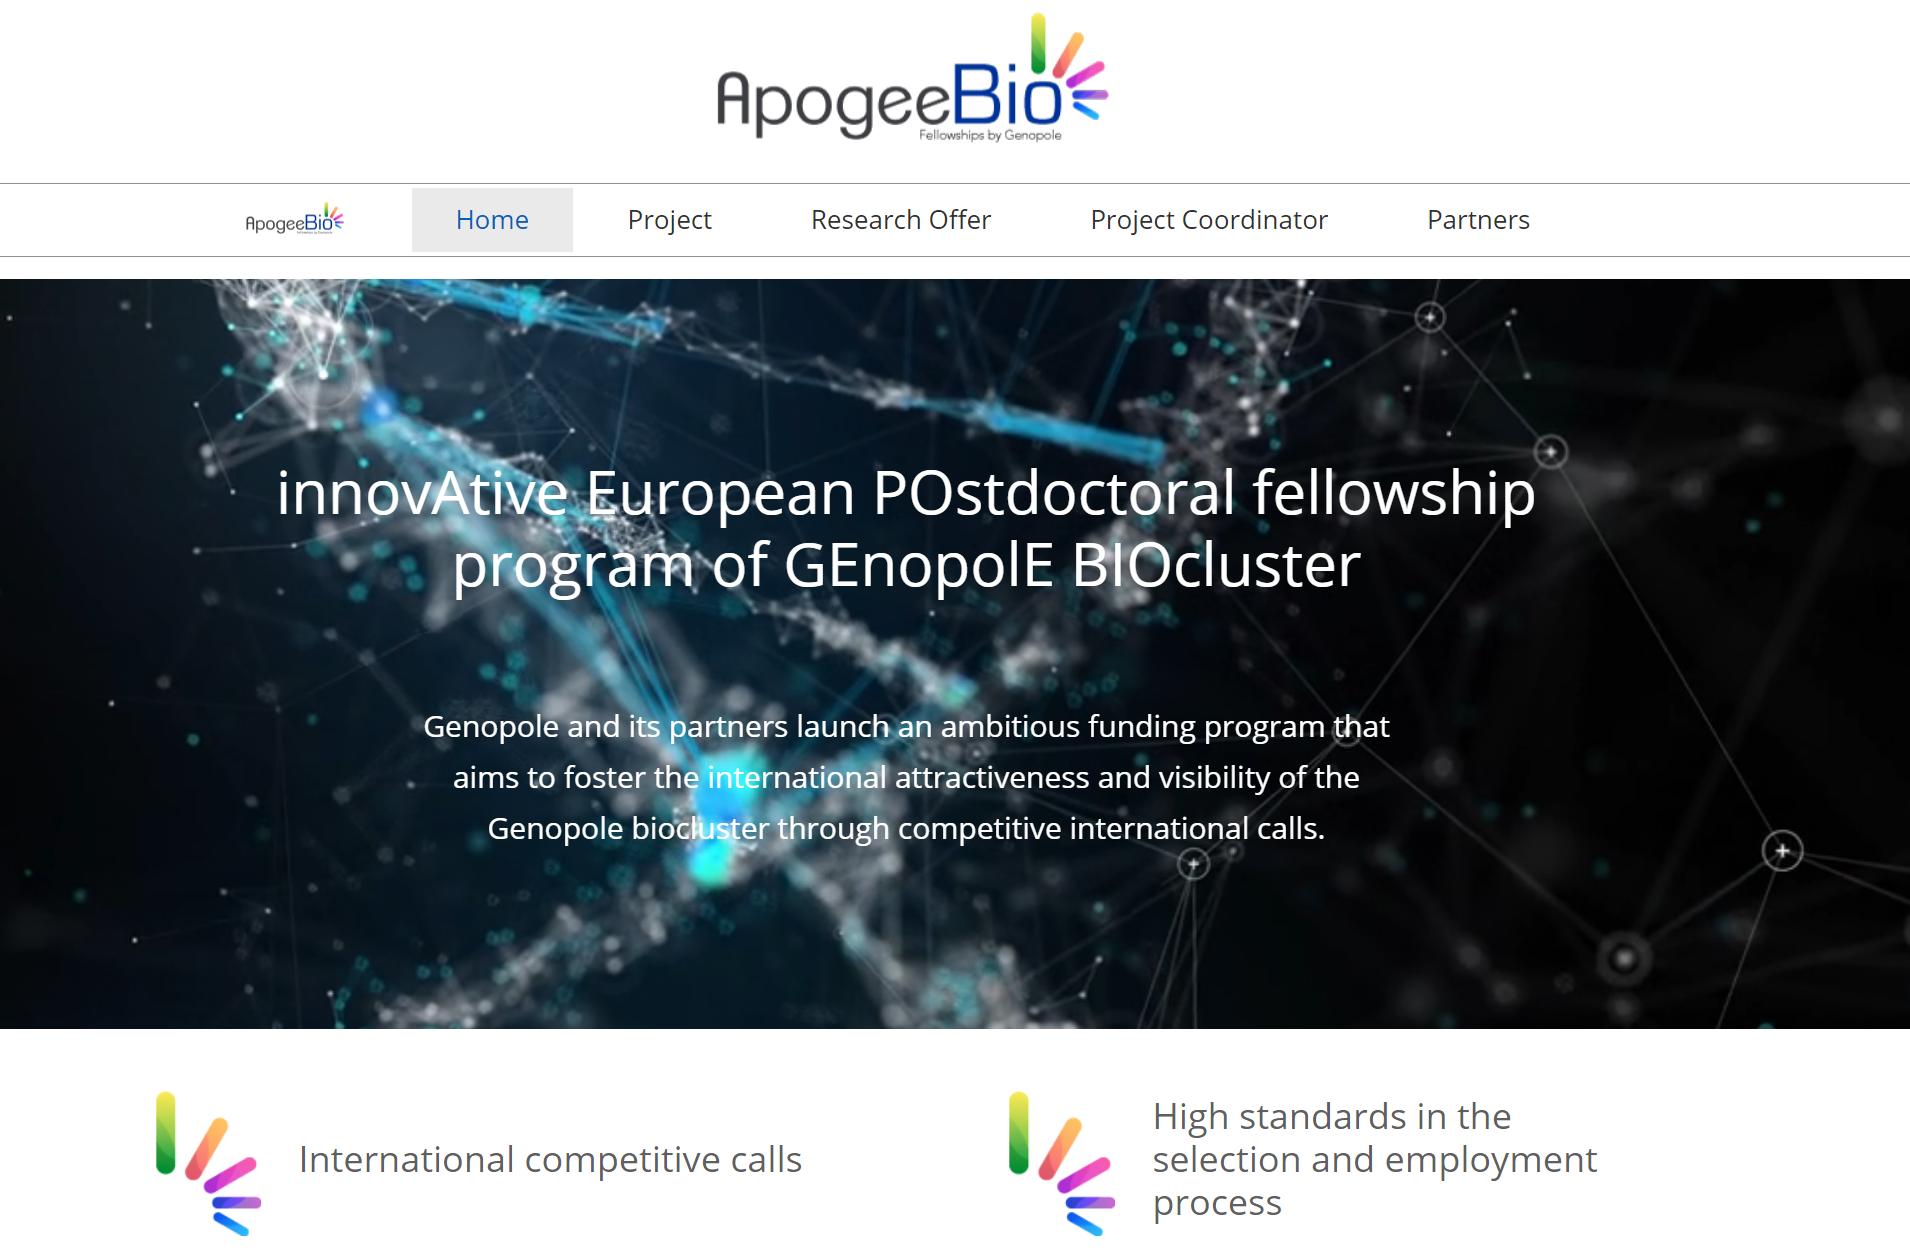 Programme européen innovant de bourses de recherche postdoctorale du GEnopole BIOcluster  ApogeeBio